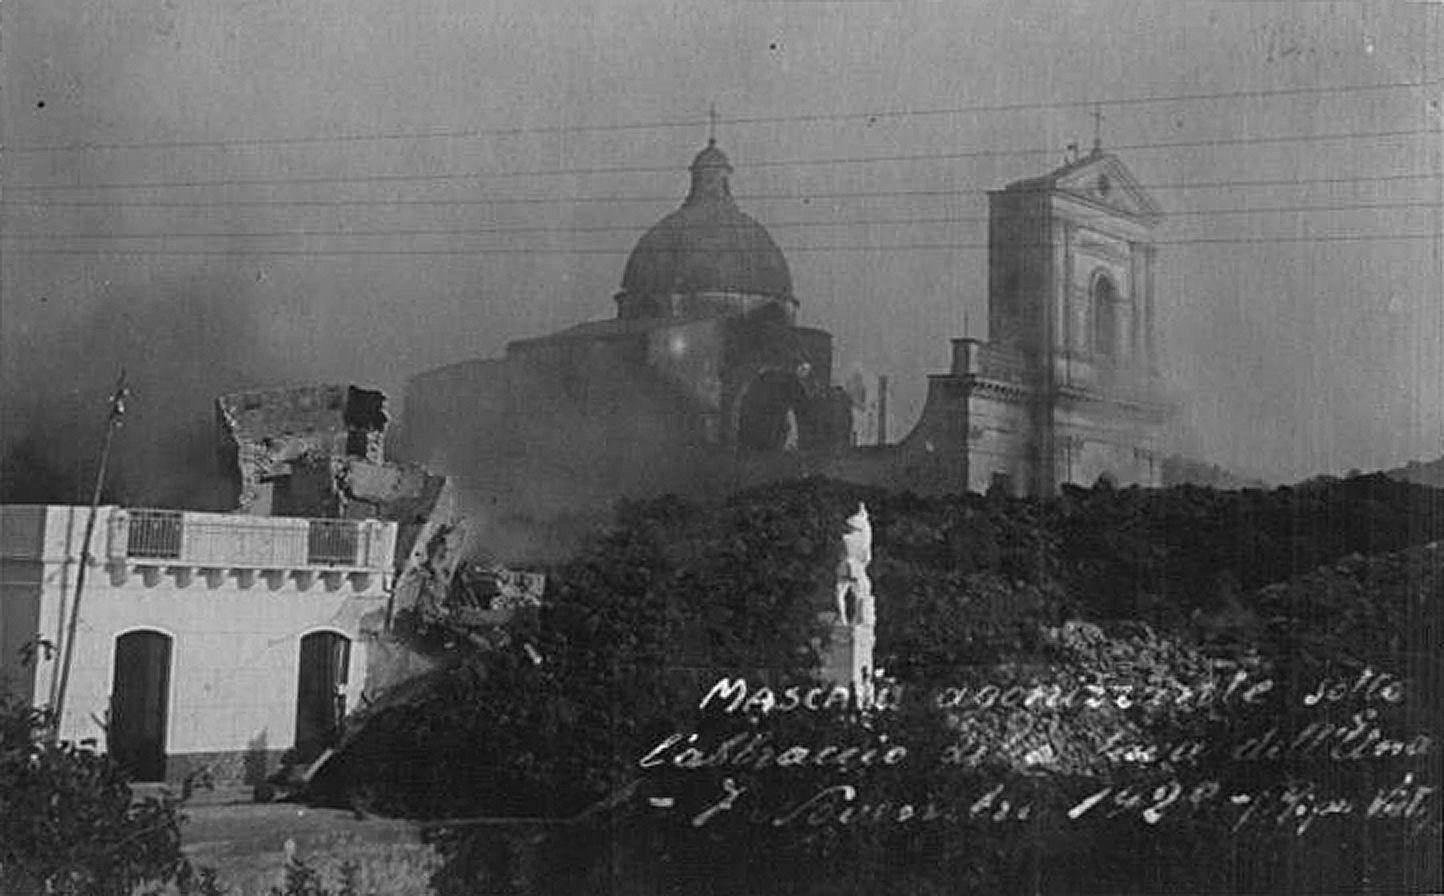 Mascali 1928 - archive postcard